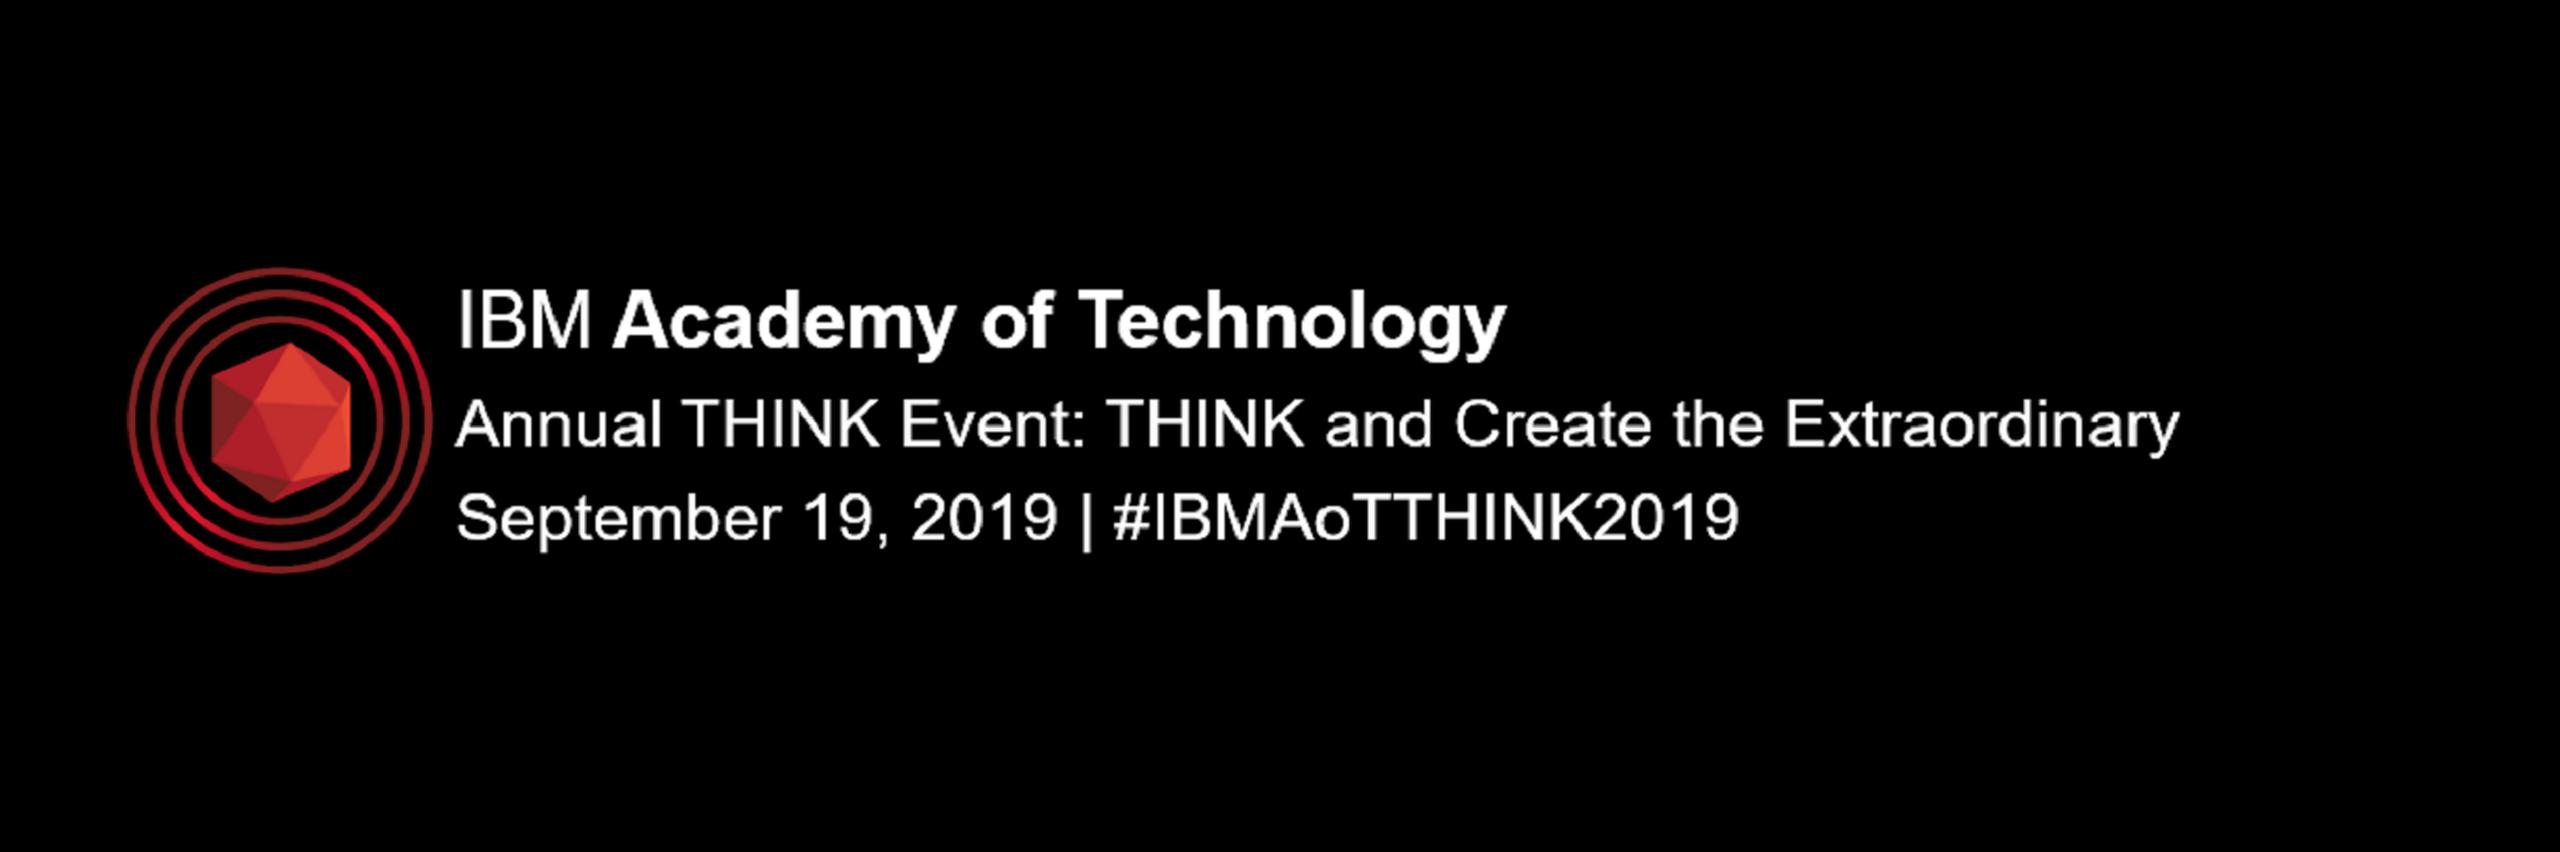 IBM AoT Annual THINK Event